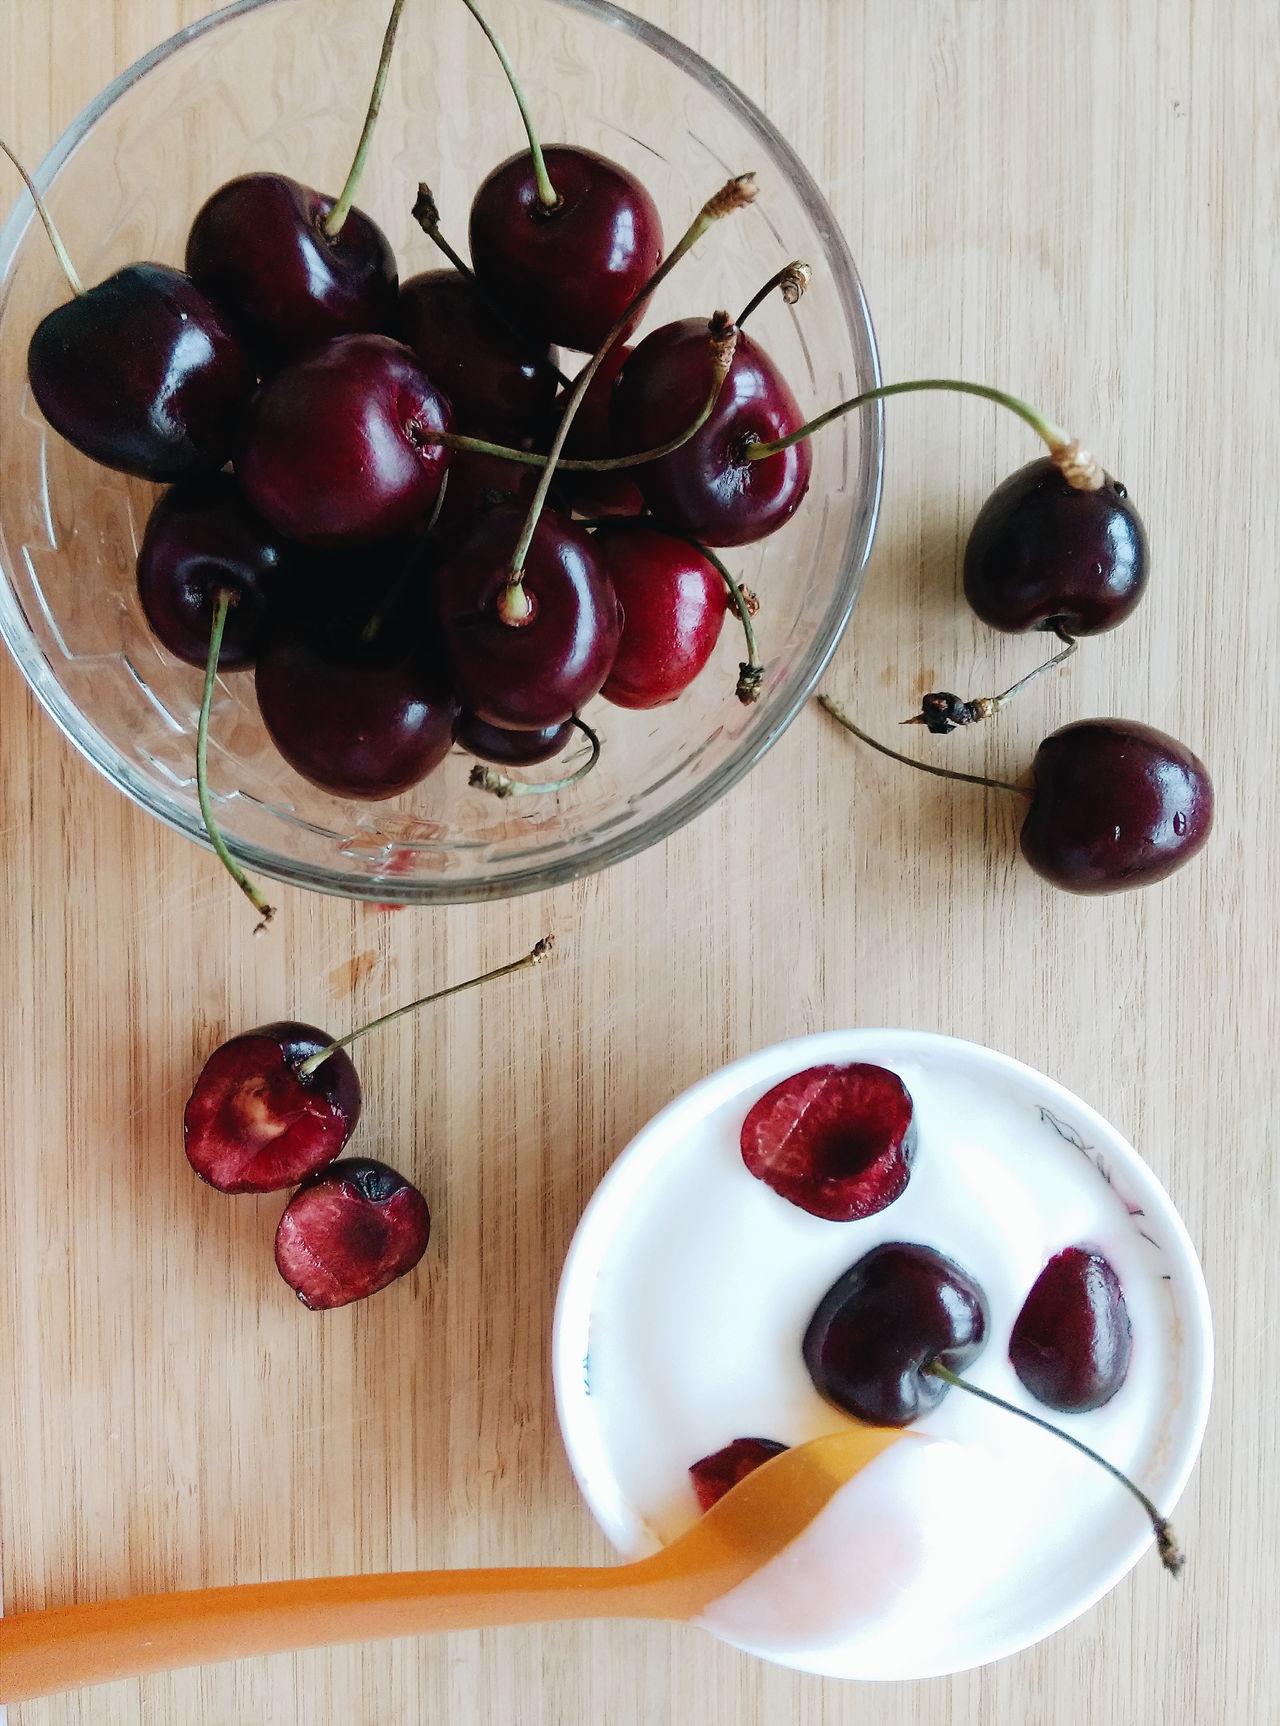 Welcome Weekly sweet cherry stillife via Fotofall